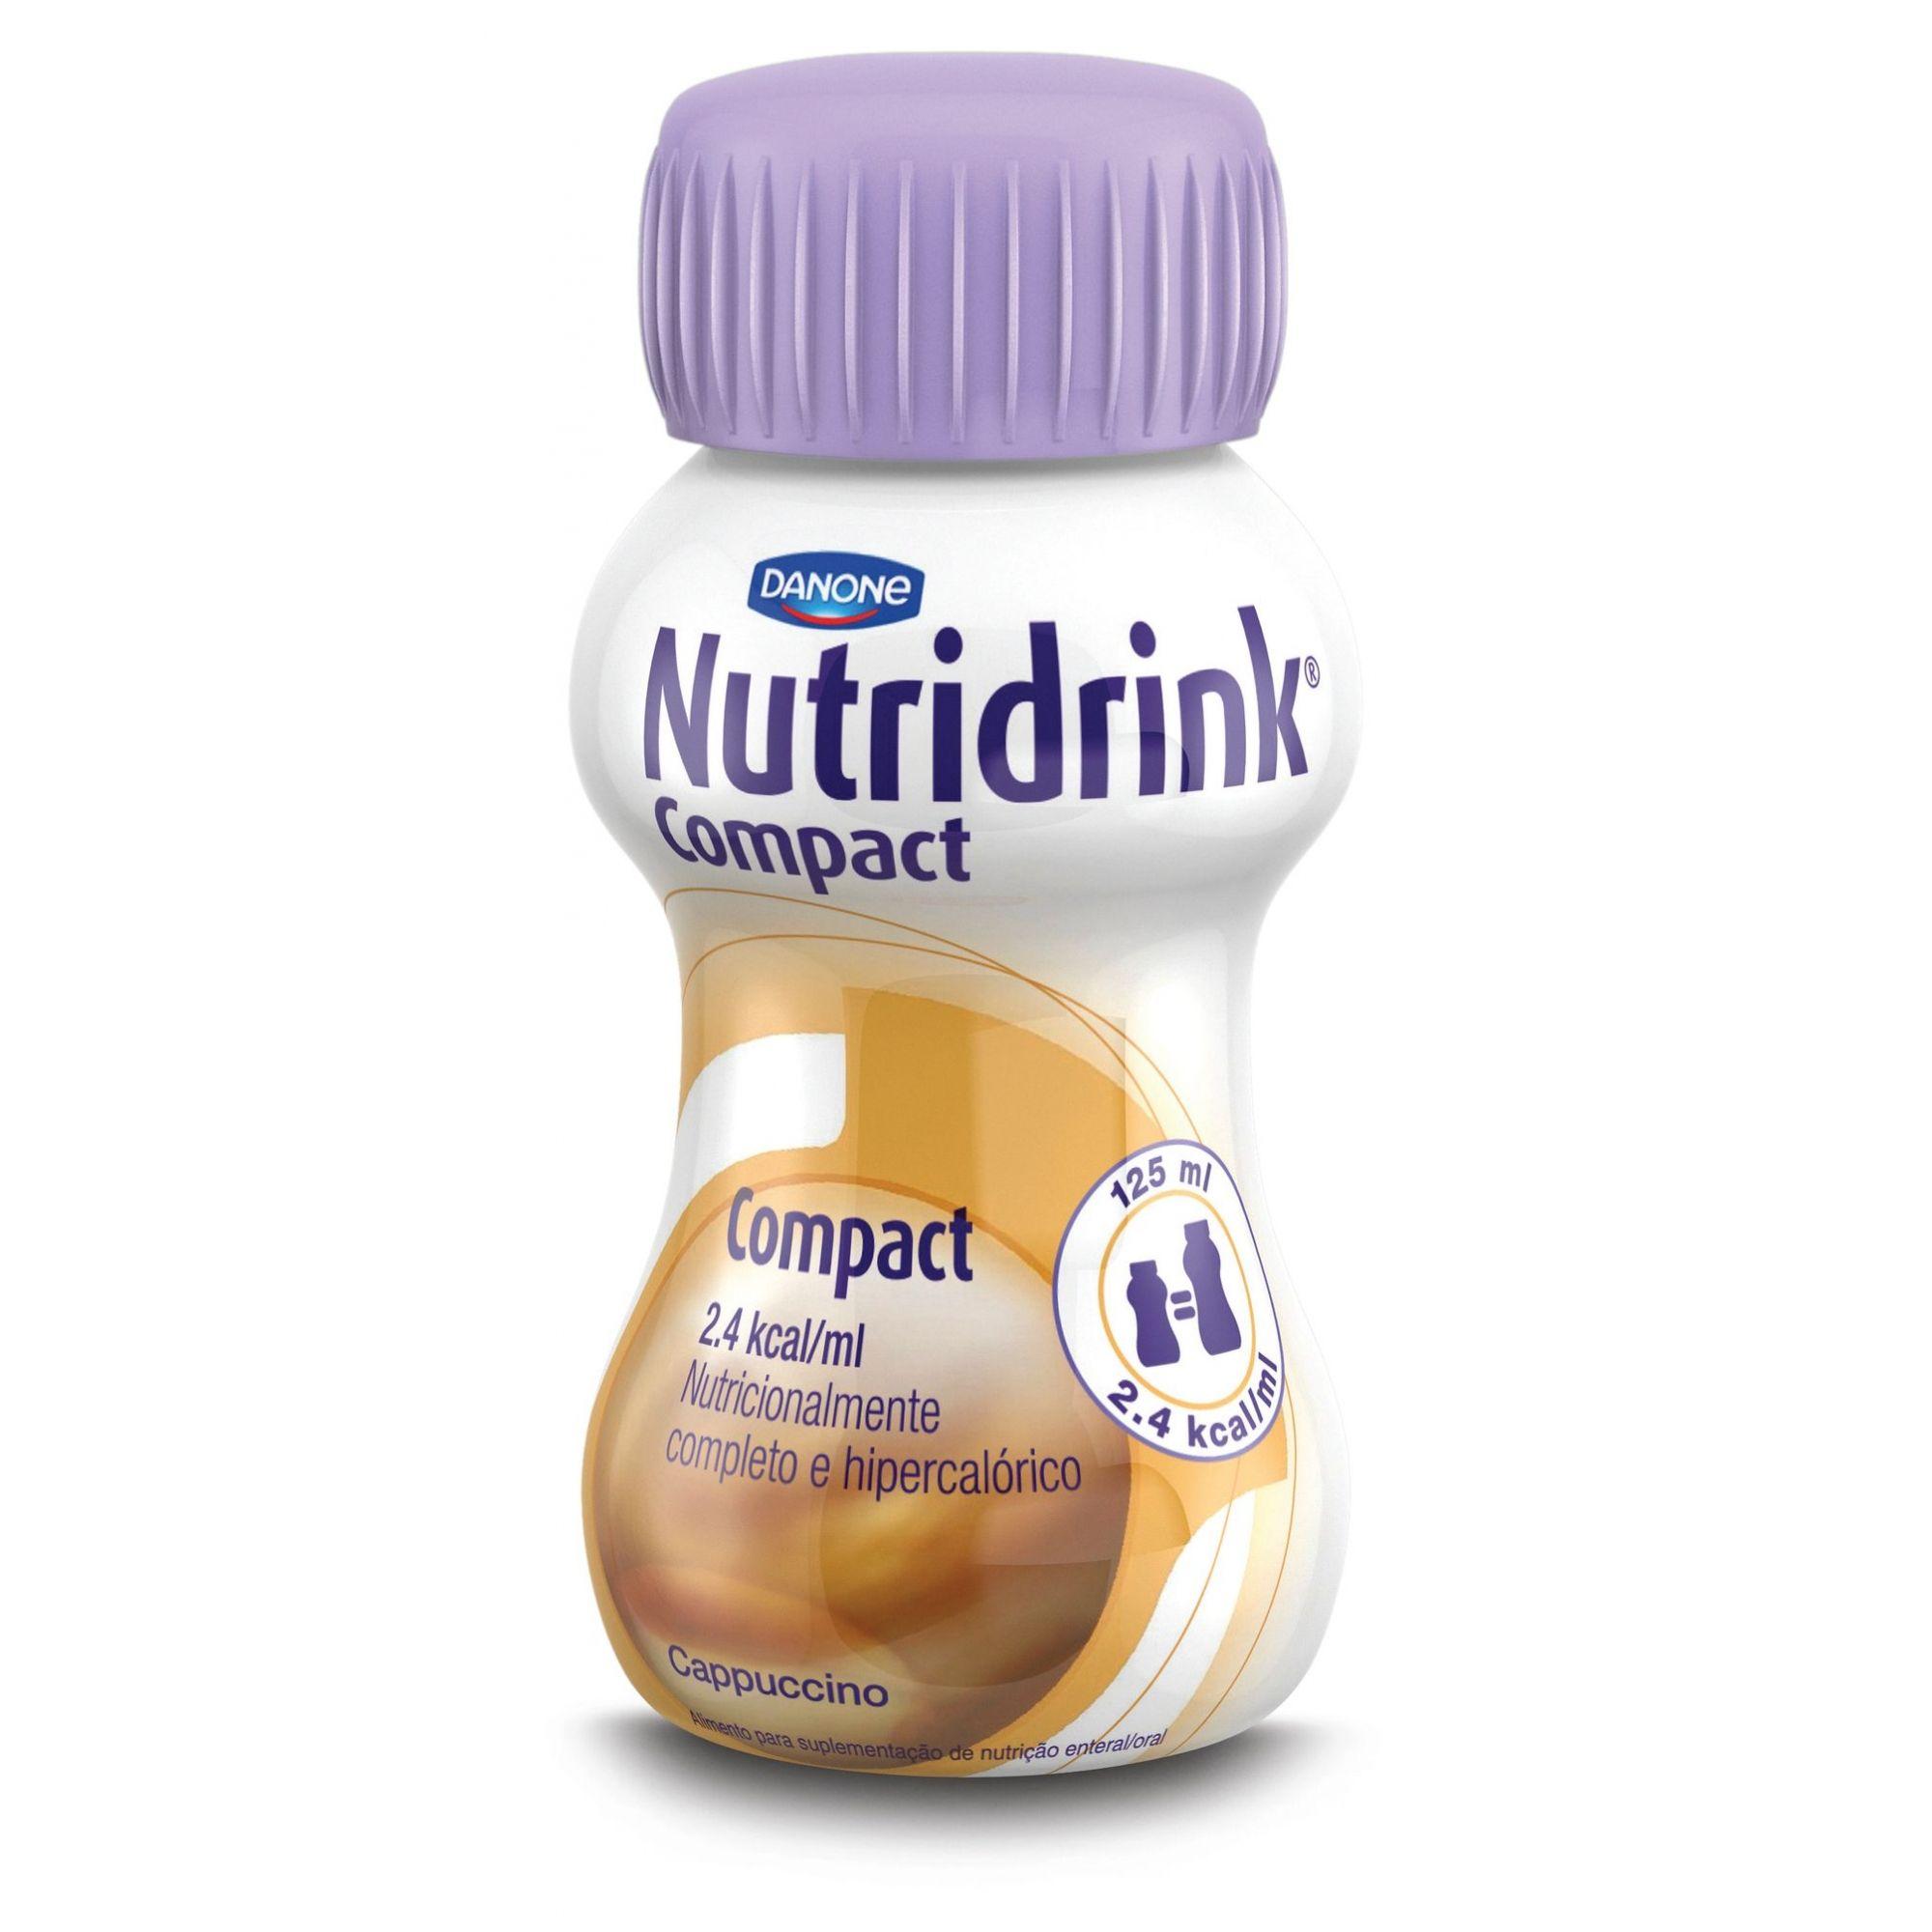 Nutridrink Compact Cappuccino - 125 mL - (DANONE)